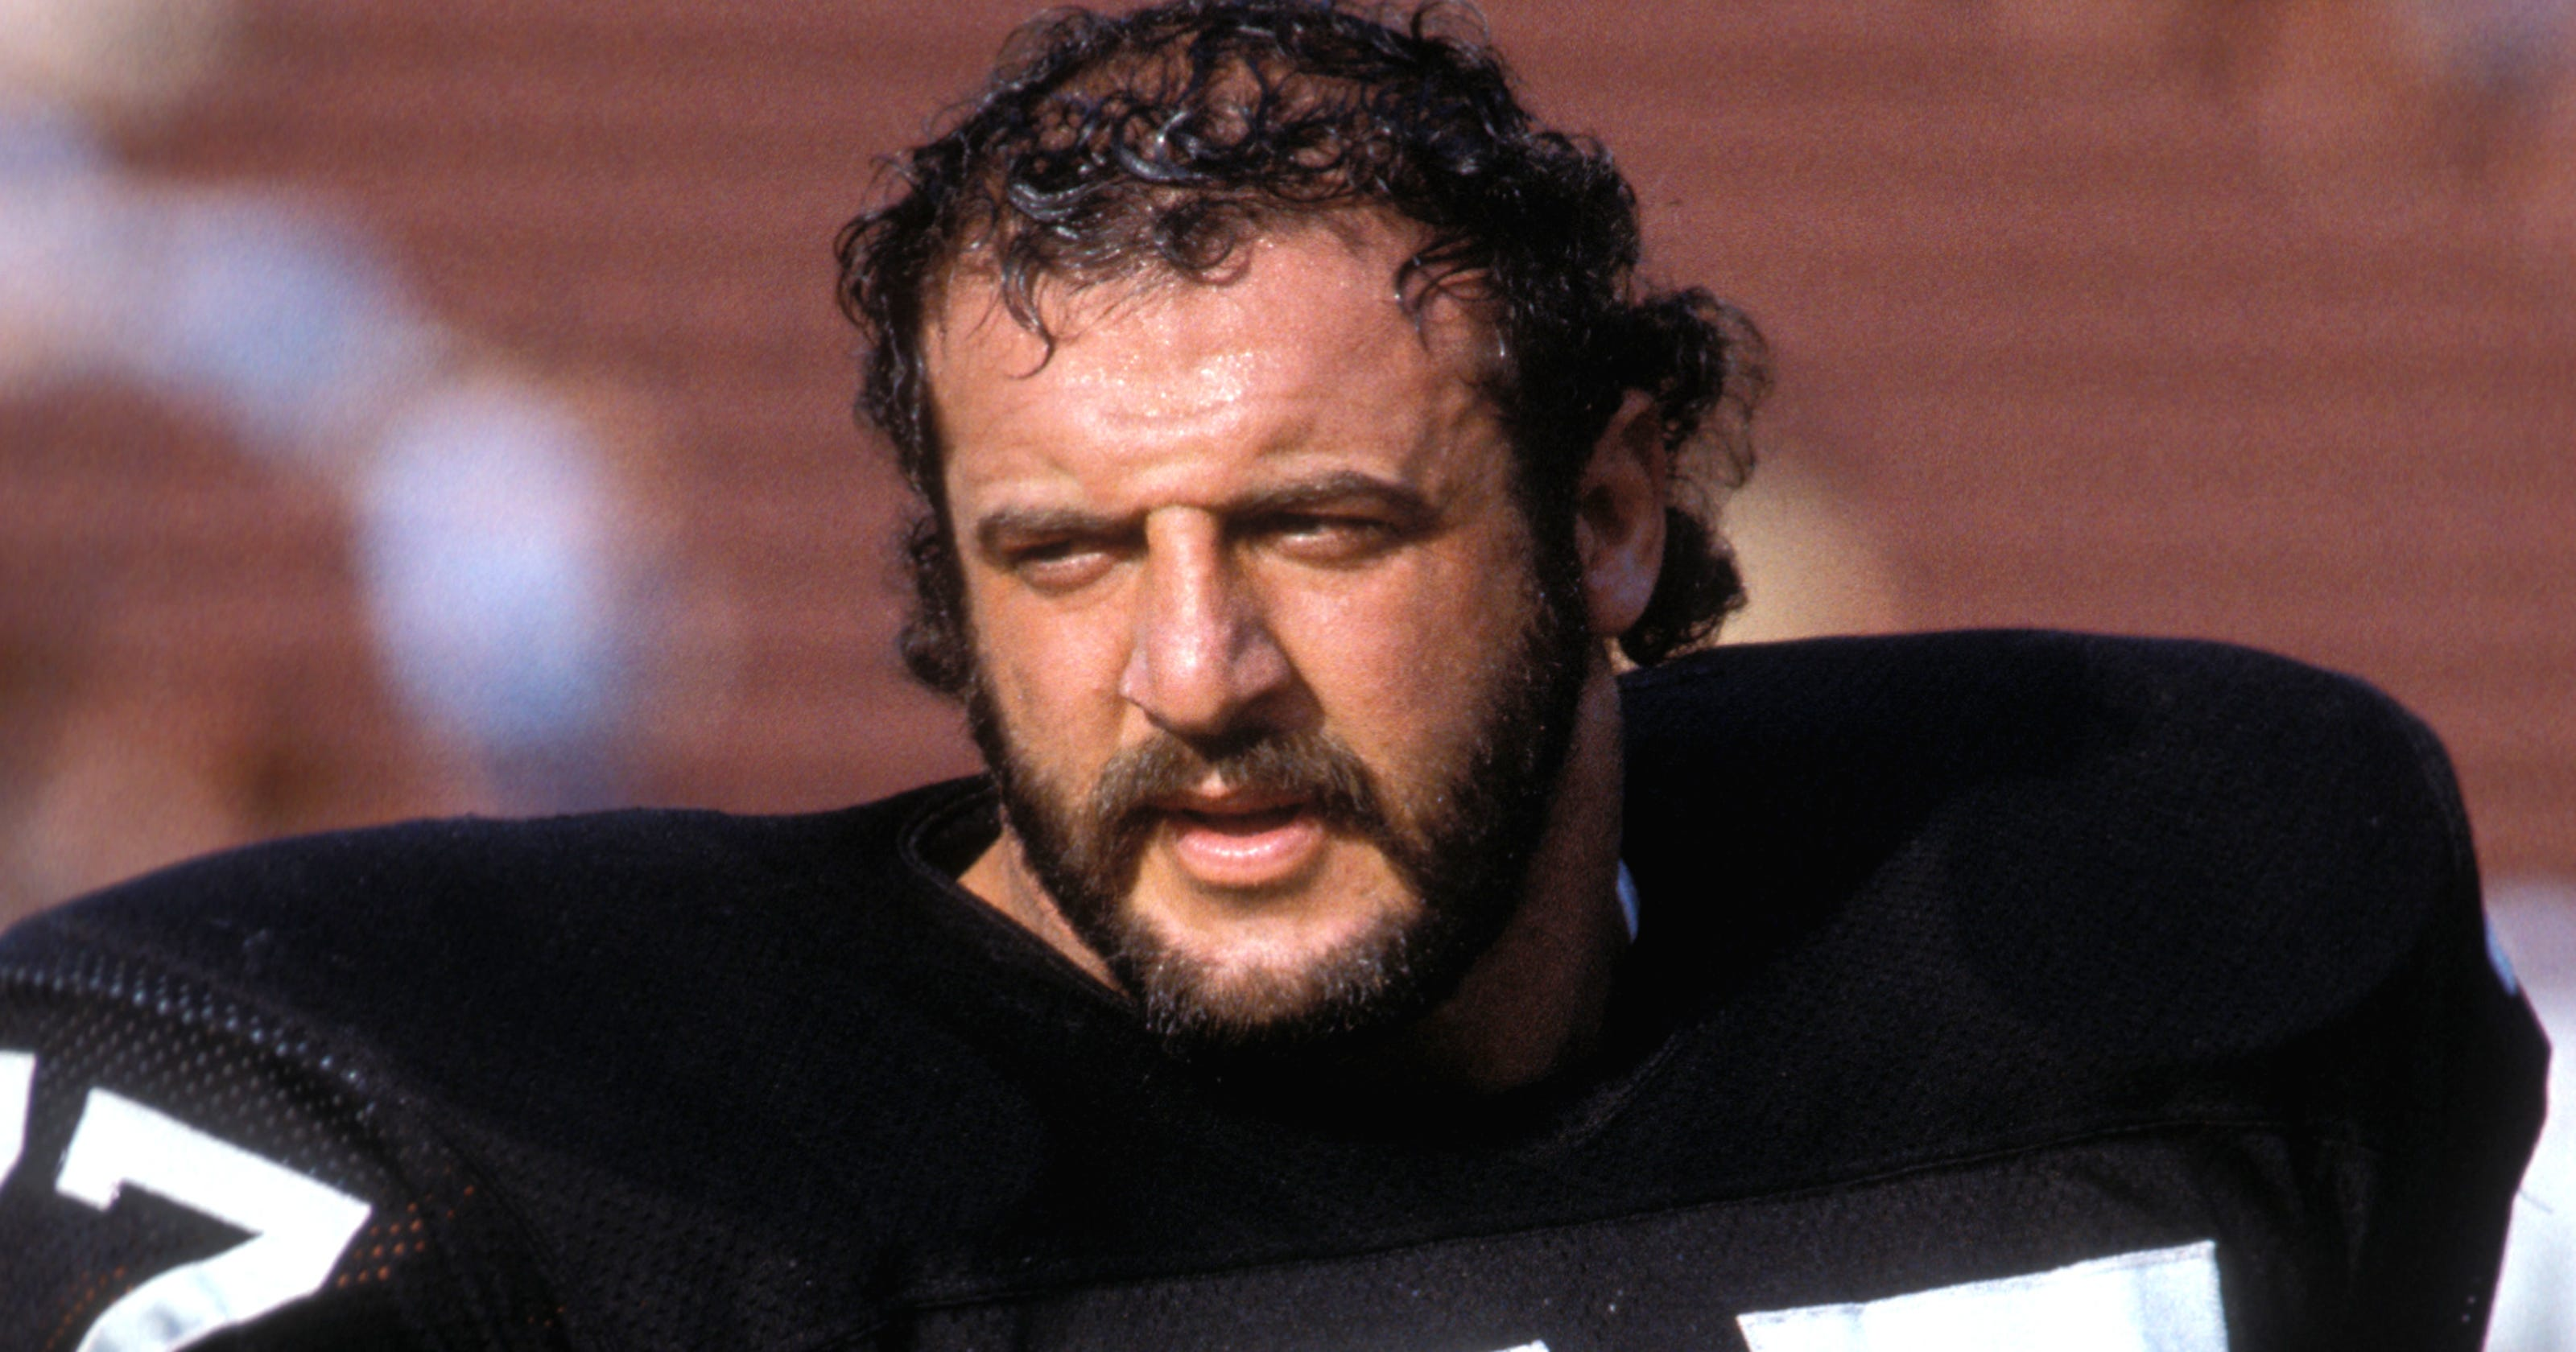 A Football Life  portrays Lyle Alzado as far more than steroid abuser edfa4cda3